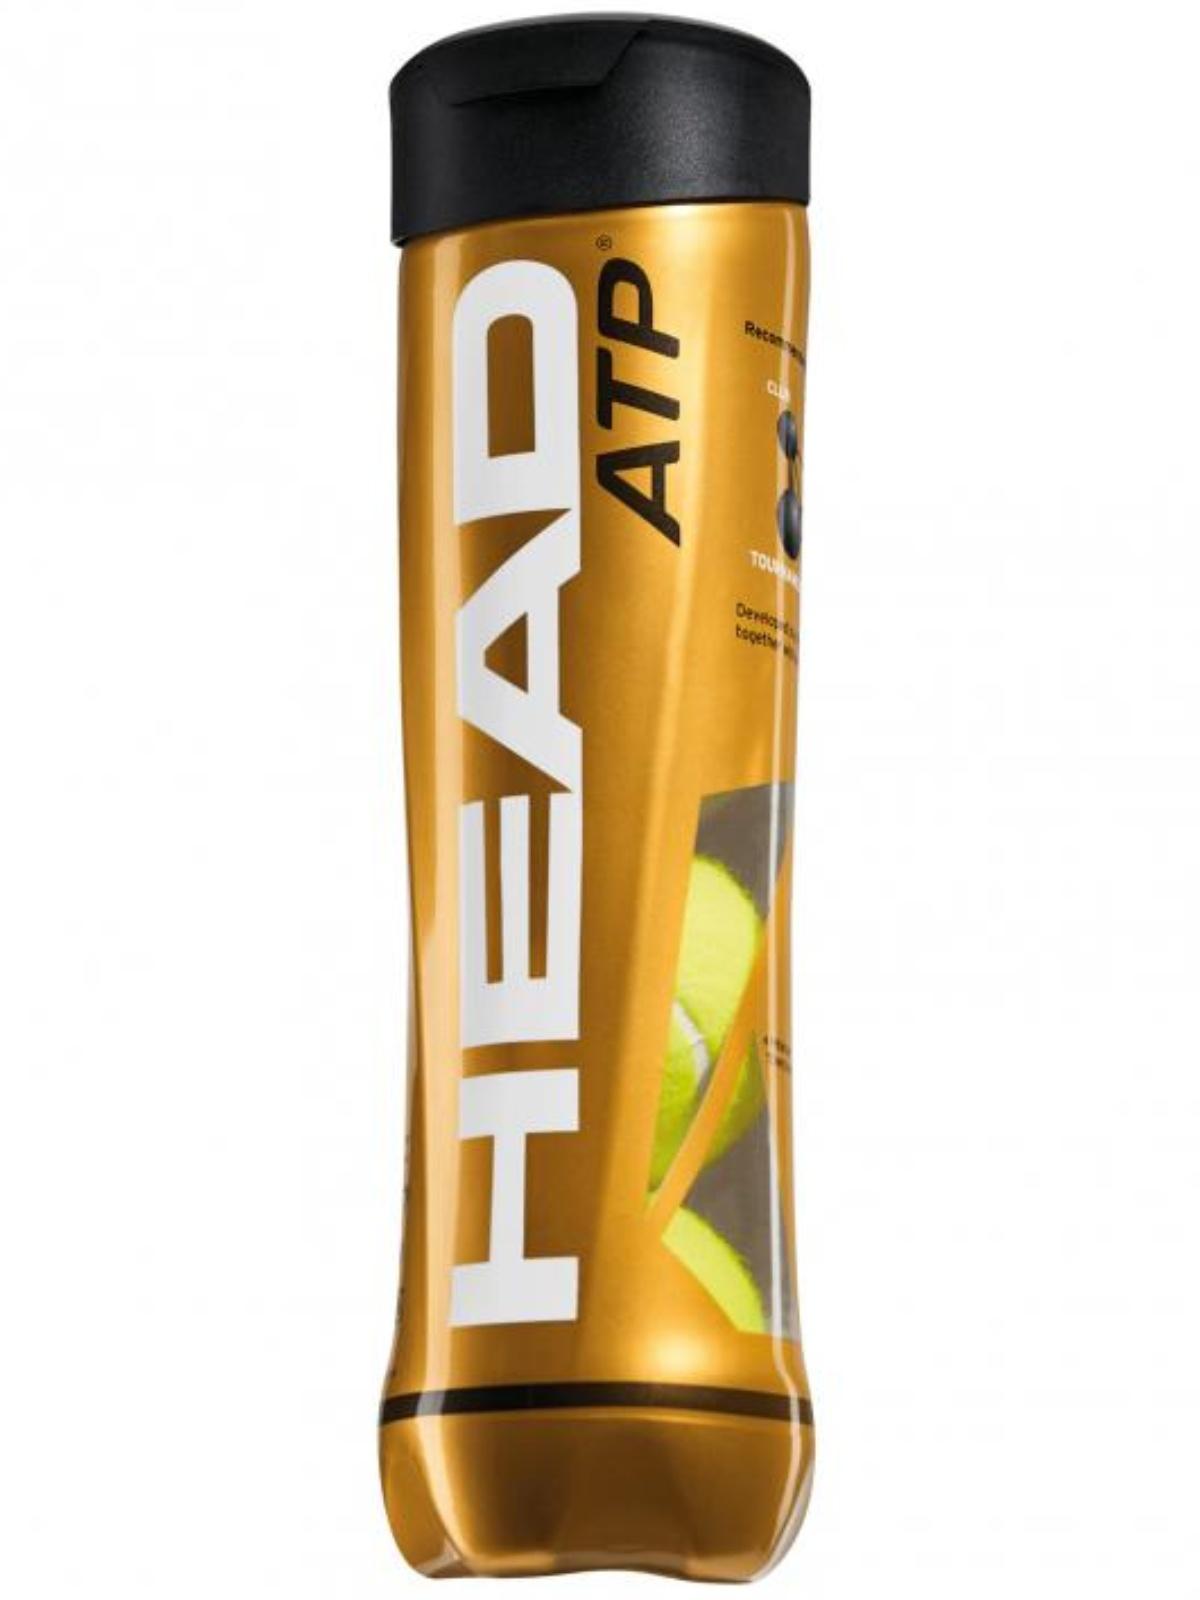 Tenisové míčky HEAD ATP metal 4 ks